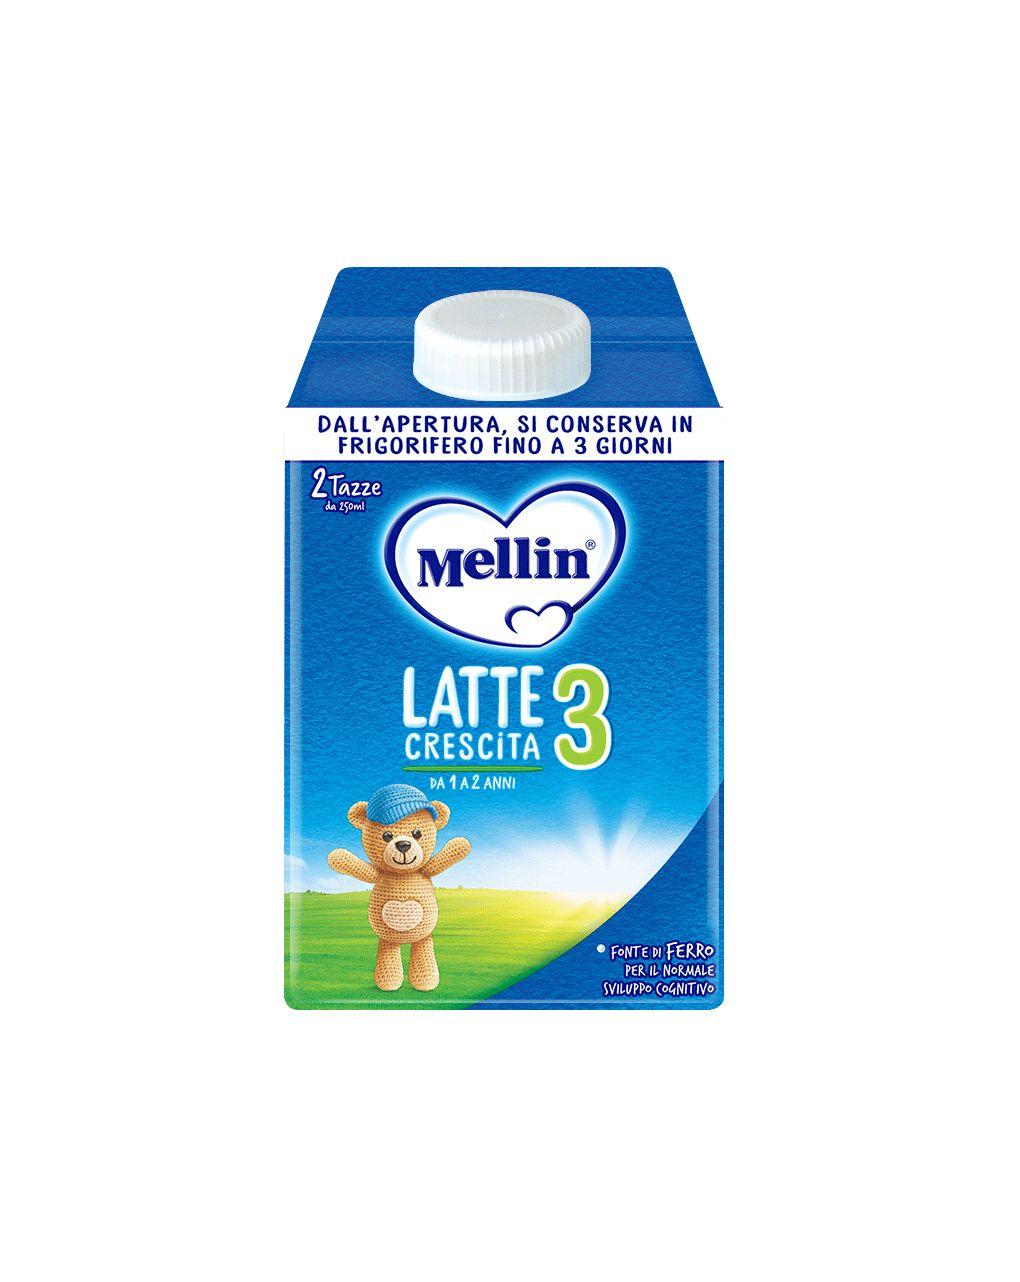 Mellin - latte mellin crescita 3 liquido 500ml - Mellin